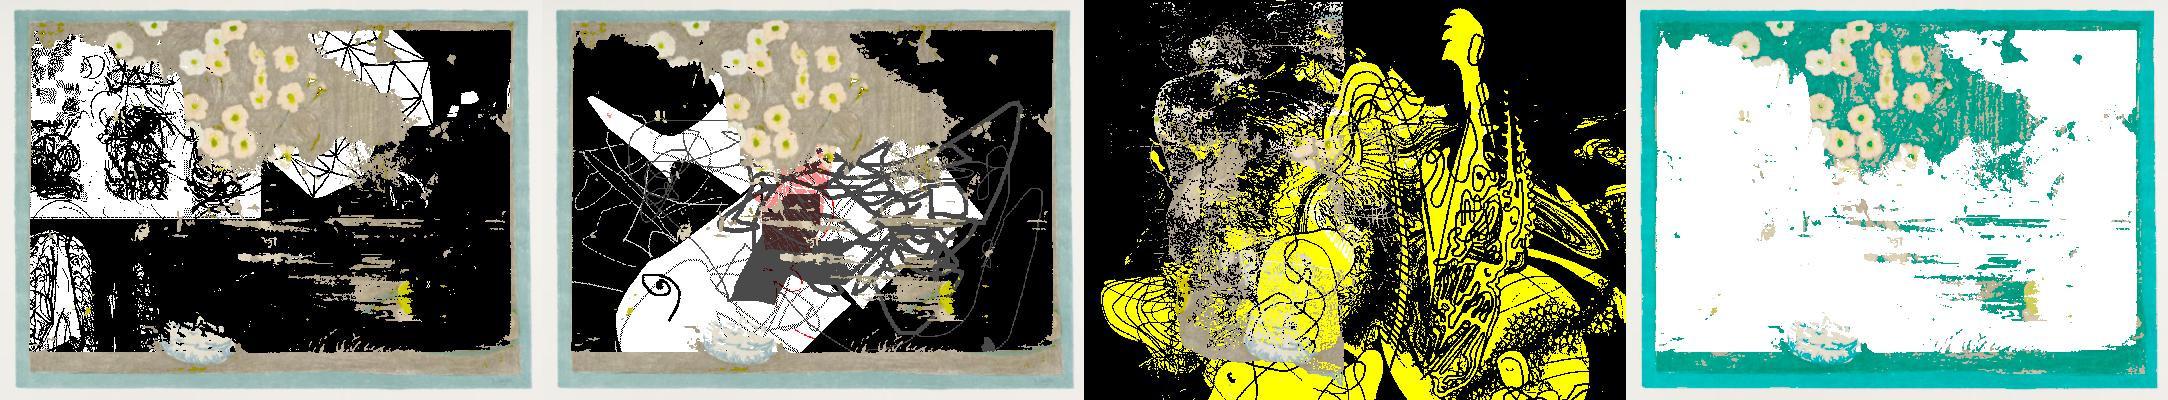 objects,_flying,_boat,_punt,_arts--10509-1604-2707-105895.jpg